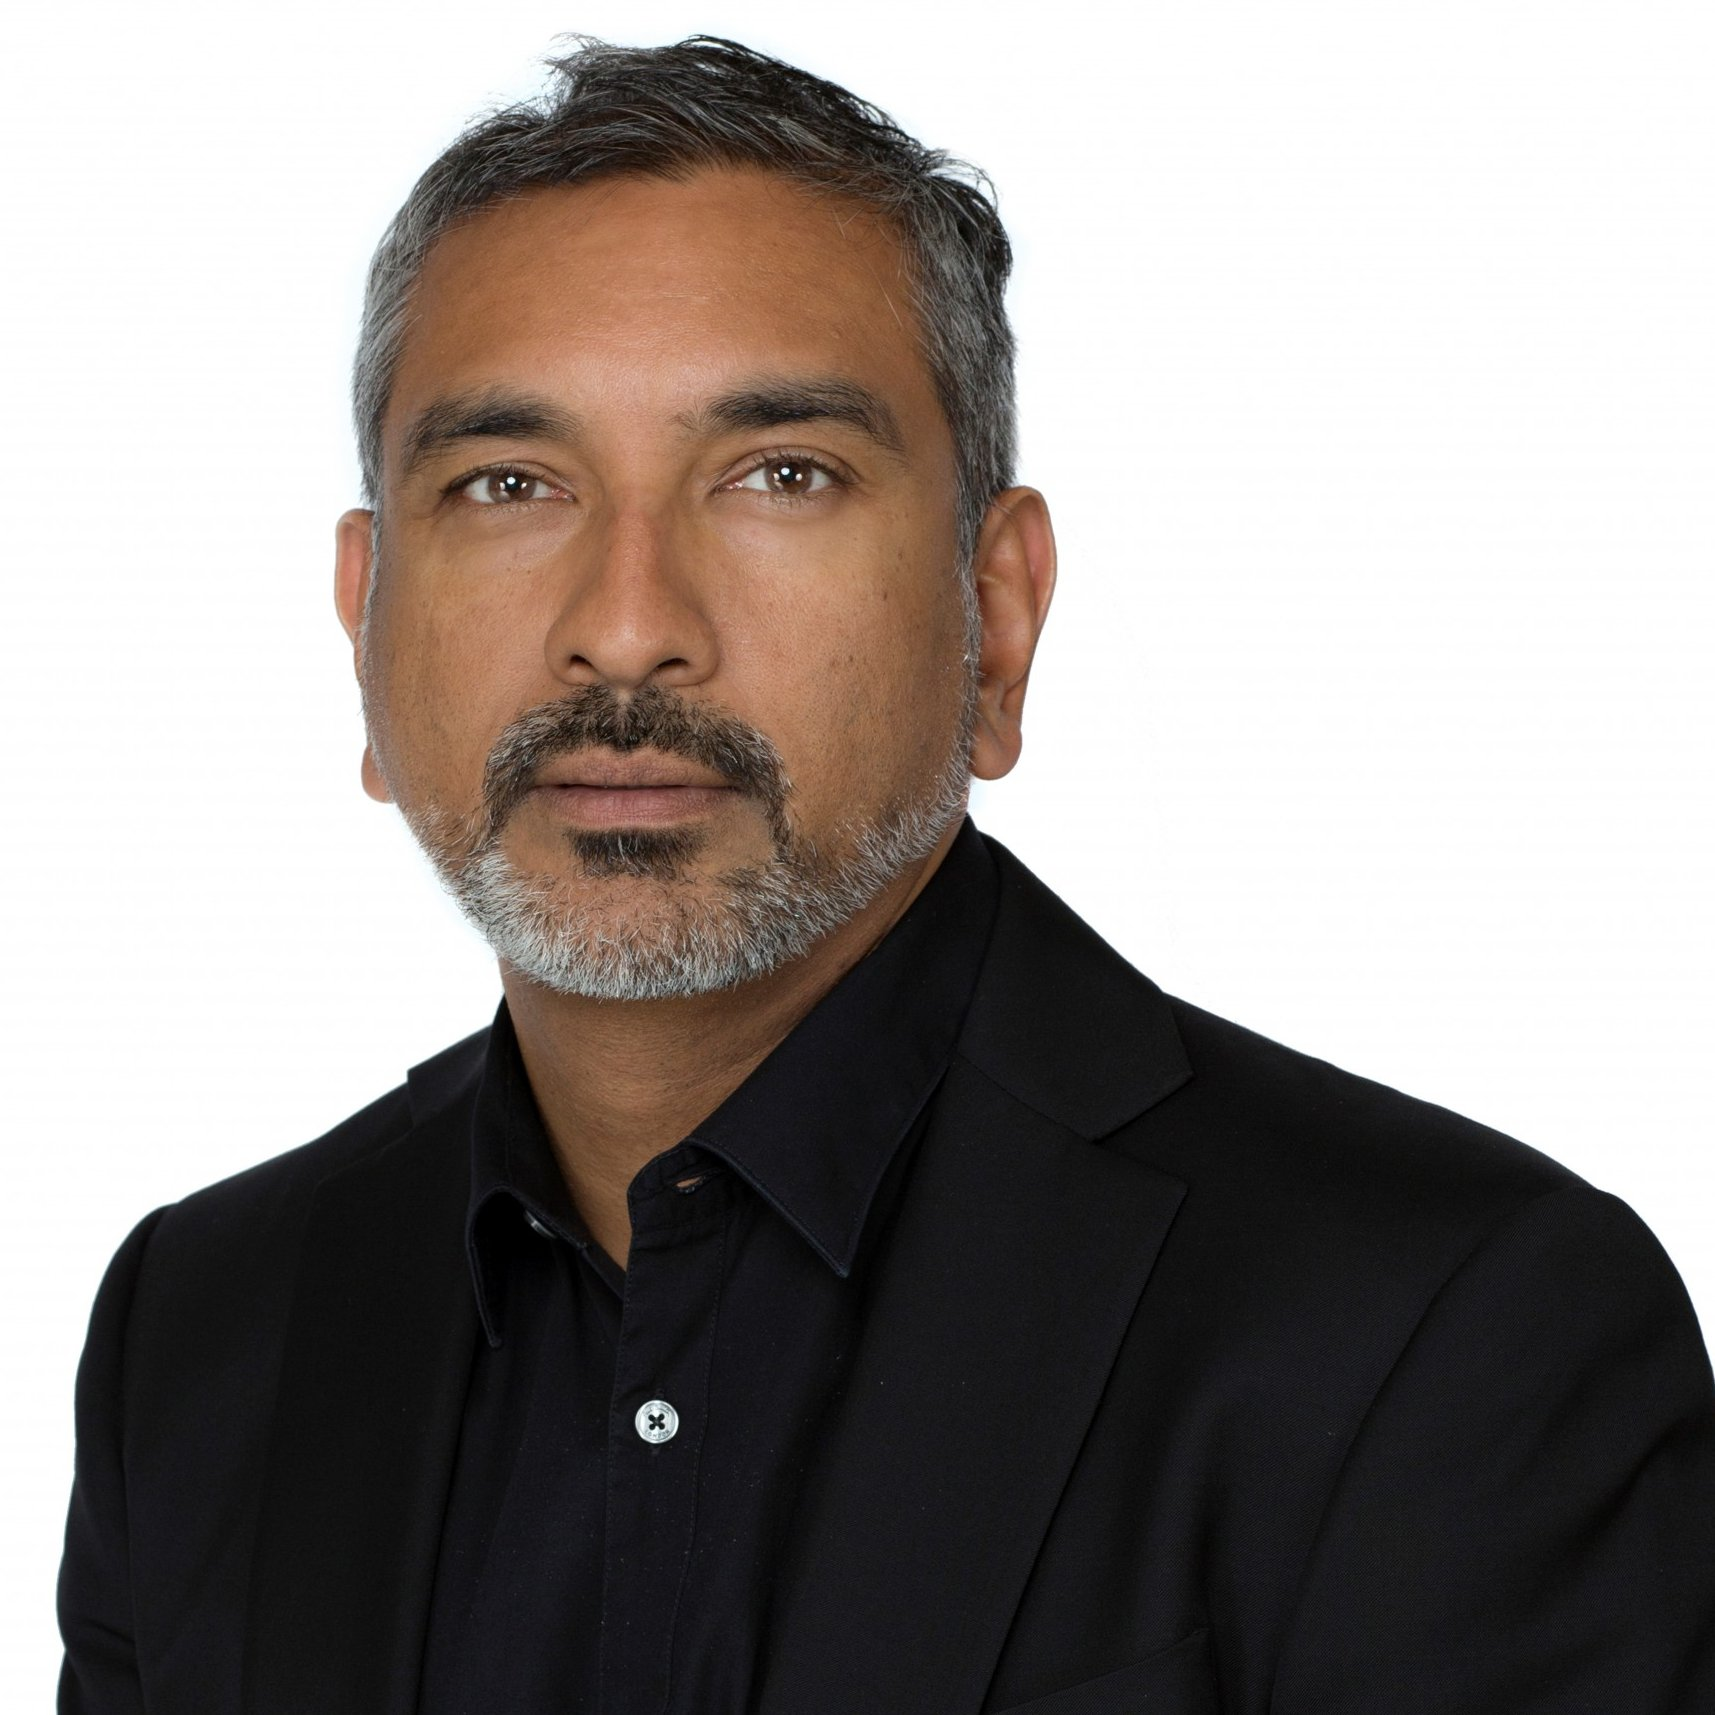 Vishaan Chakrabarti Head Shot